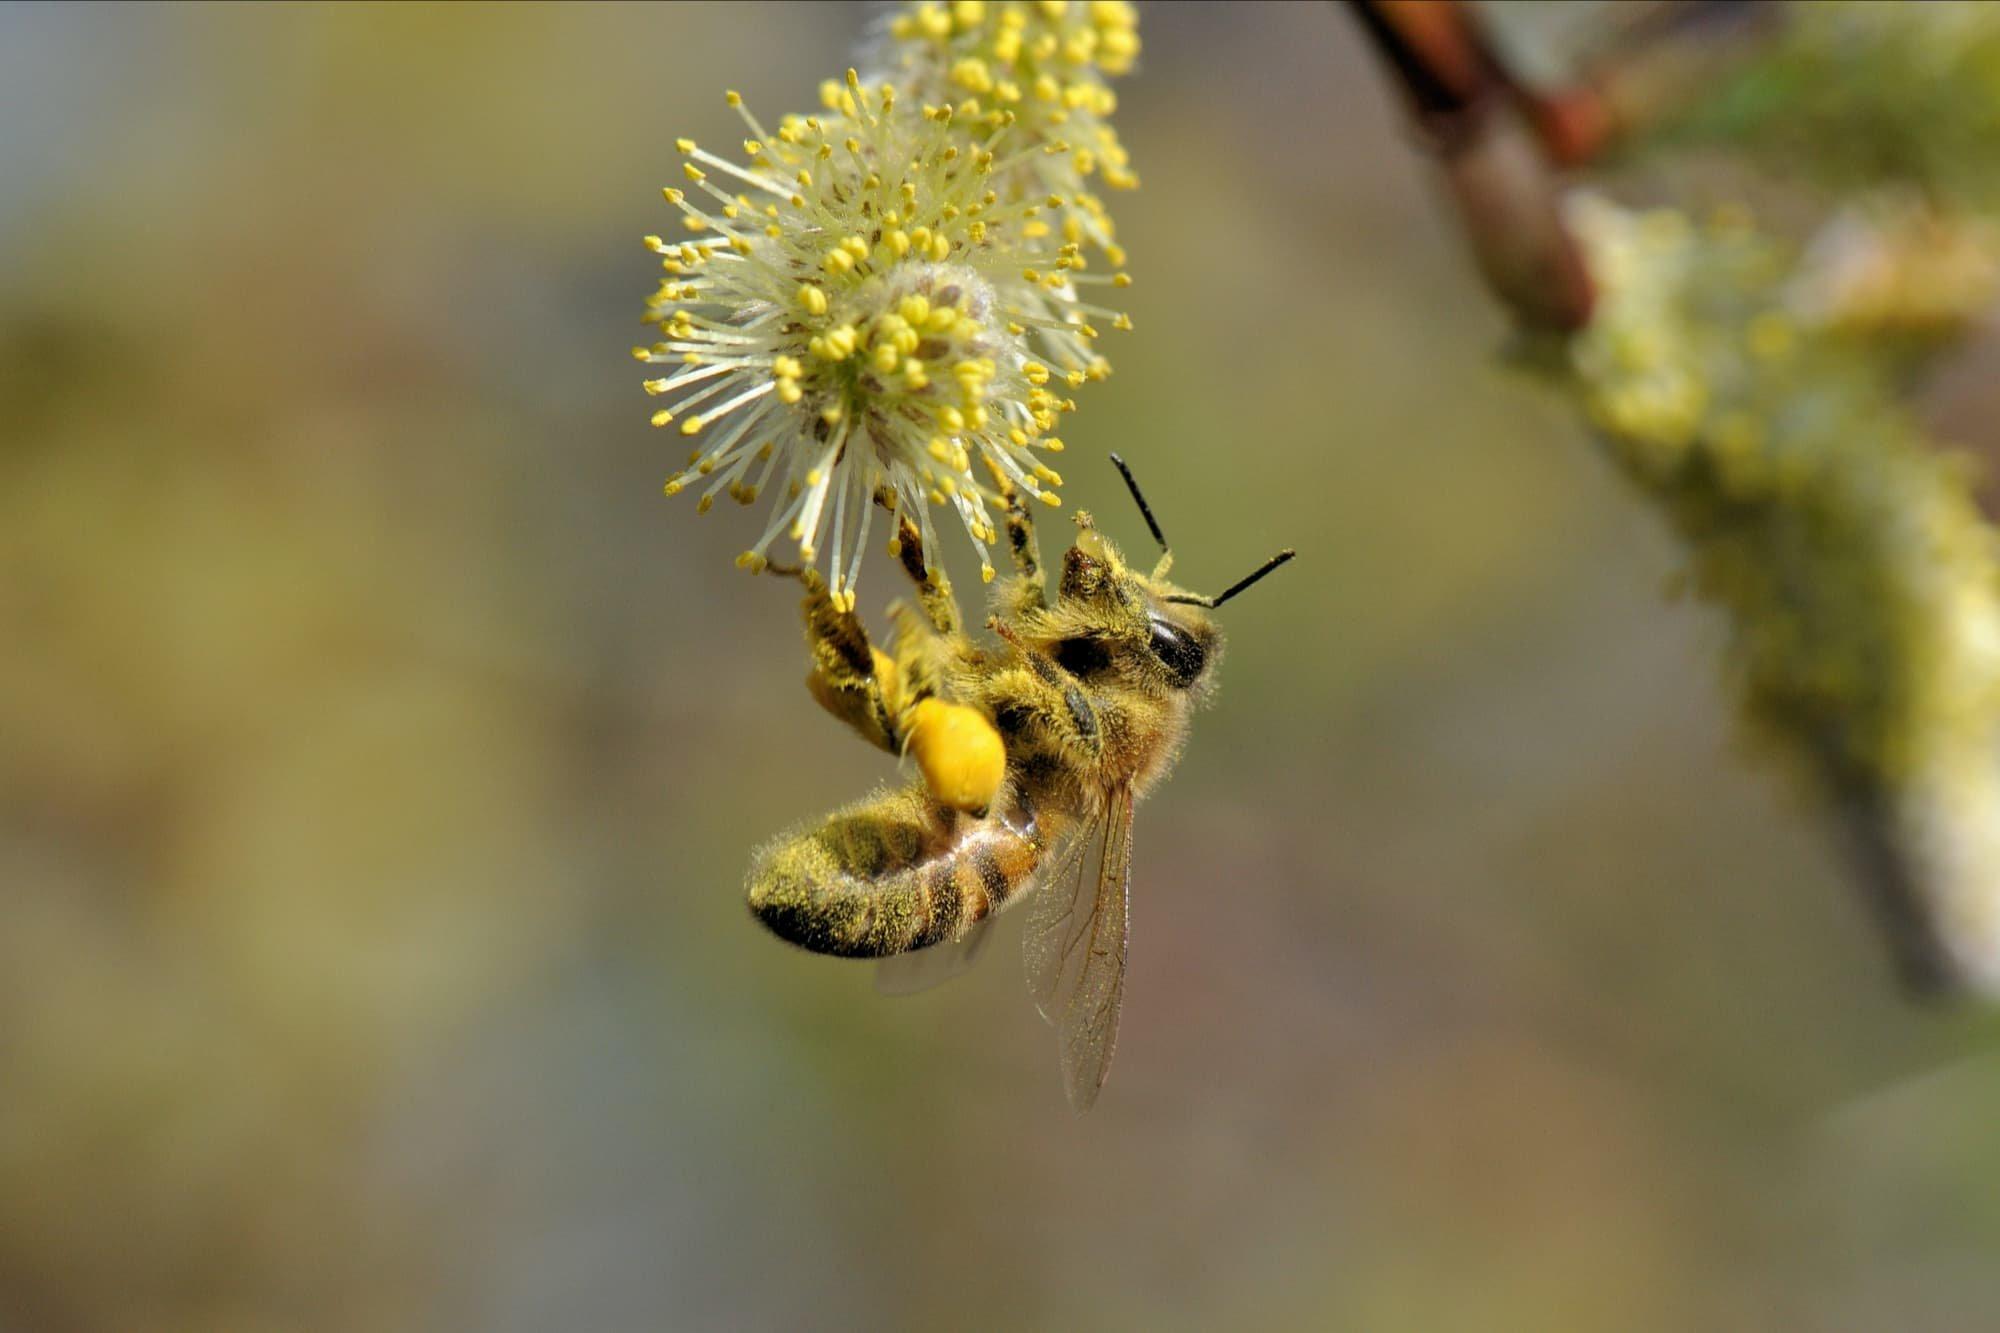 2014-03-10 Honingbij met klompjes-3 en nectar.jpg